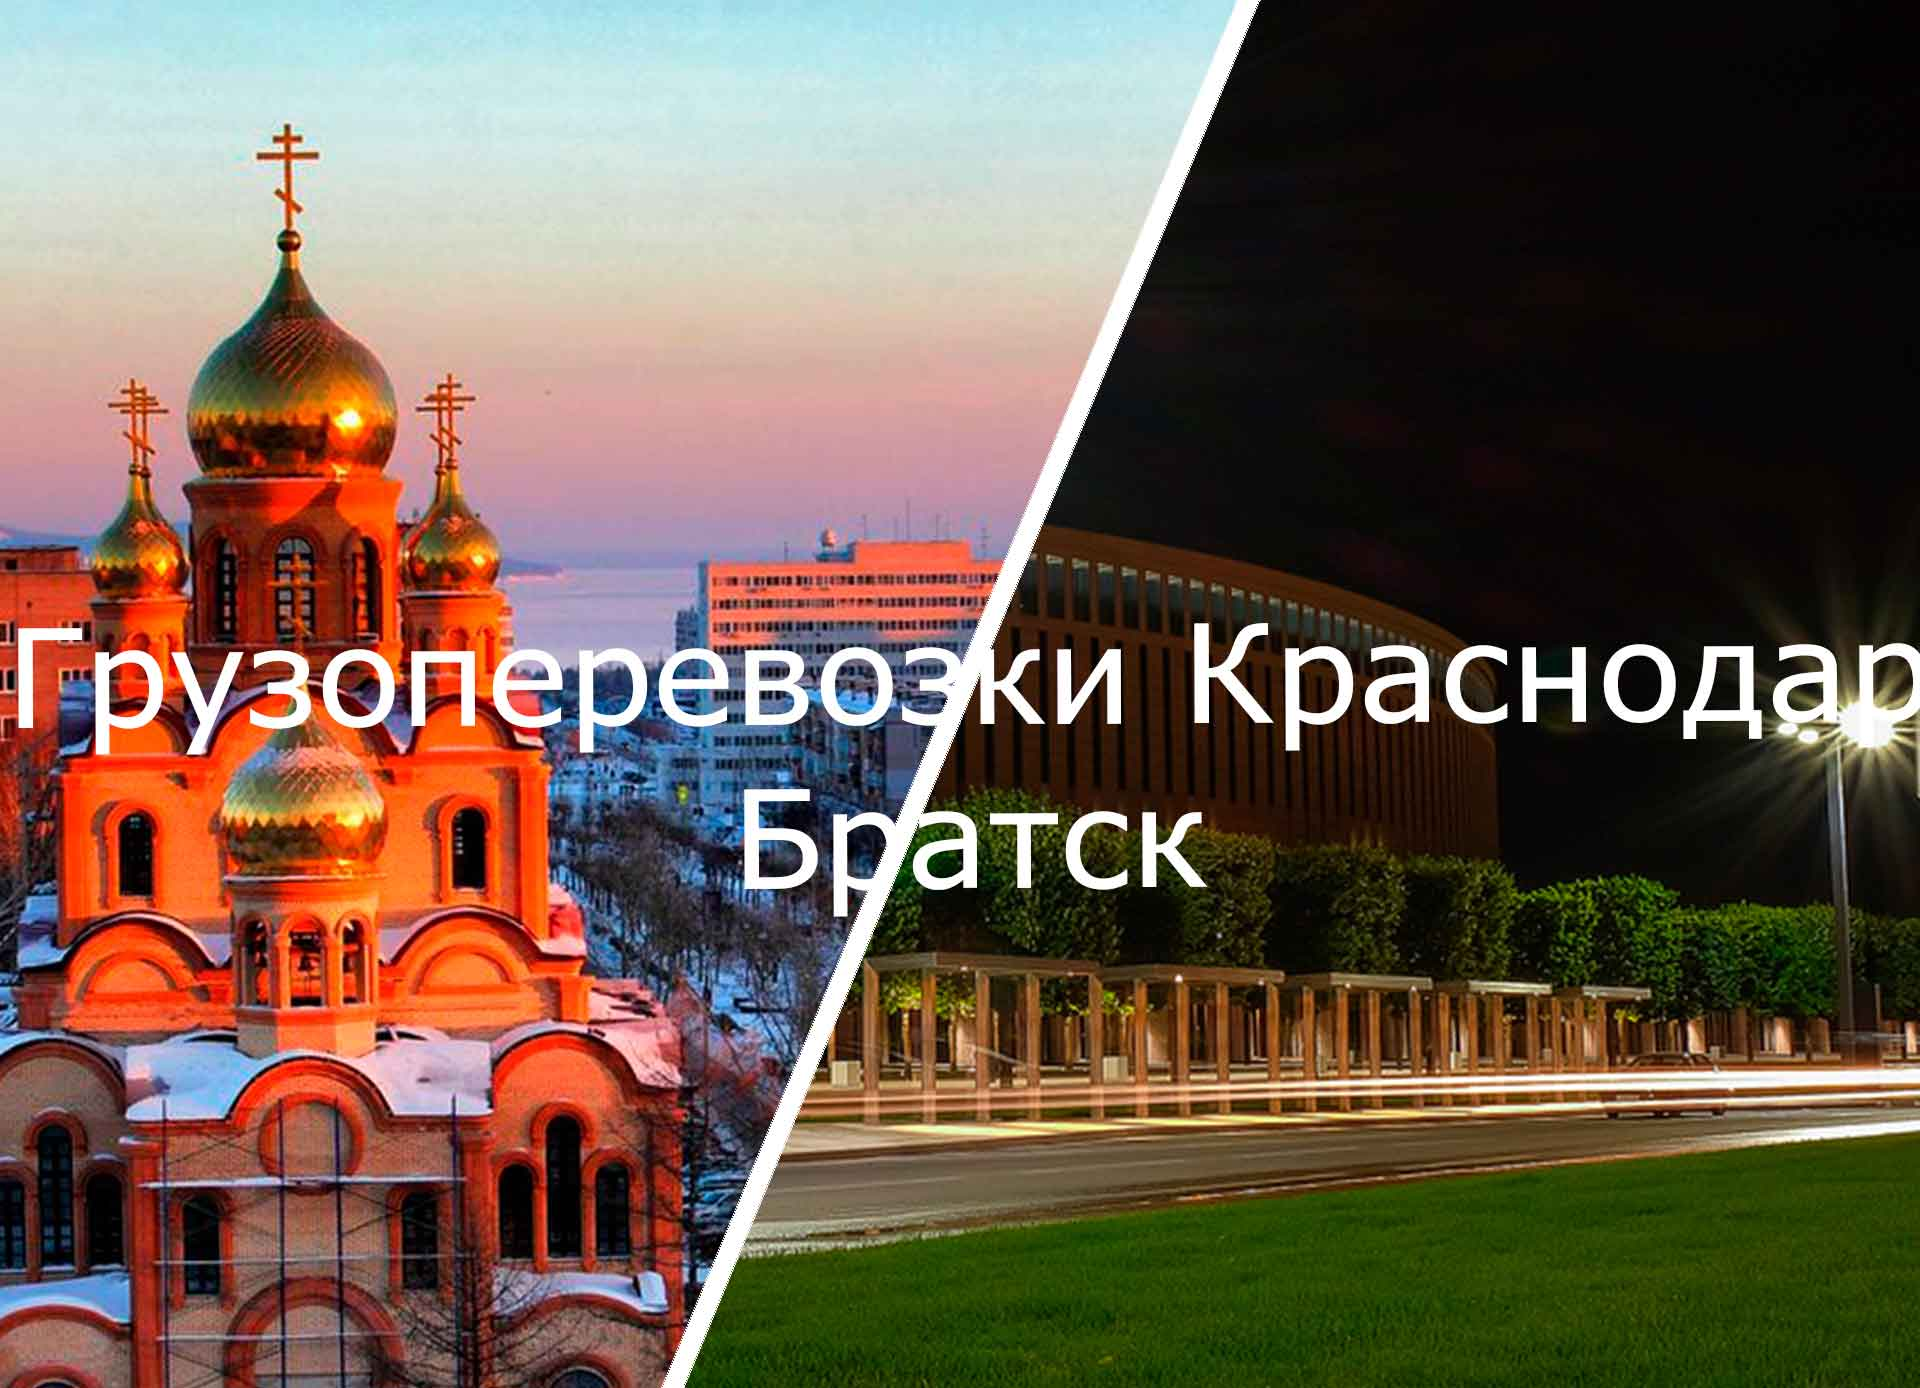 грузоперевозки краснодар братск